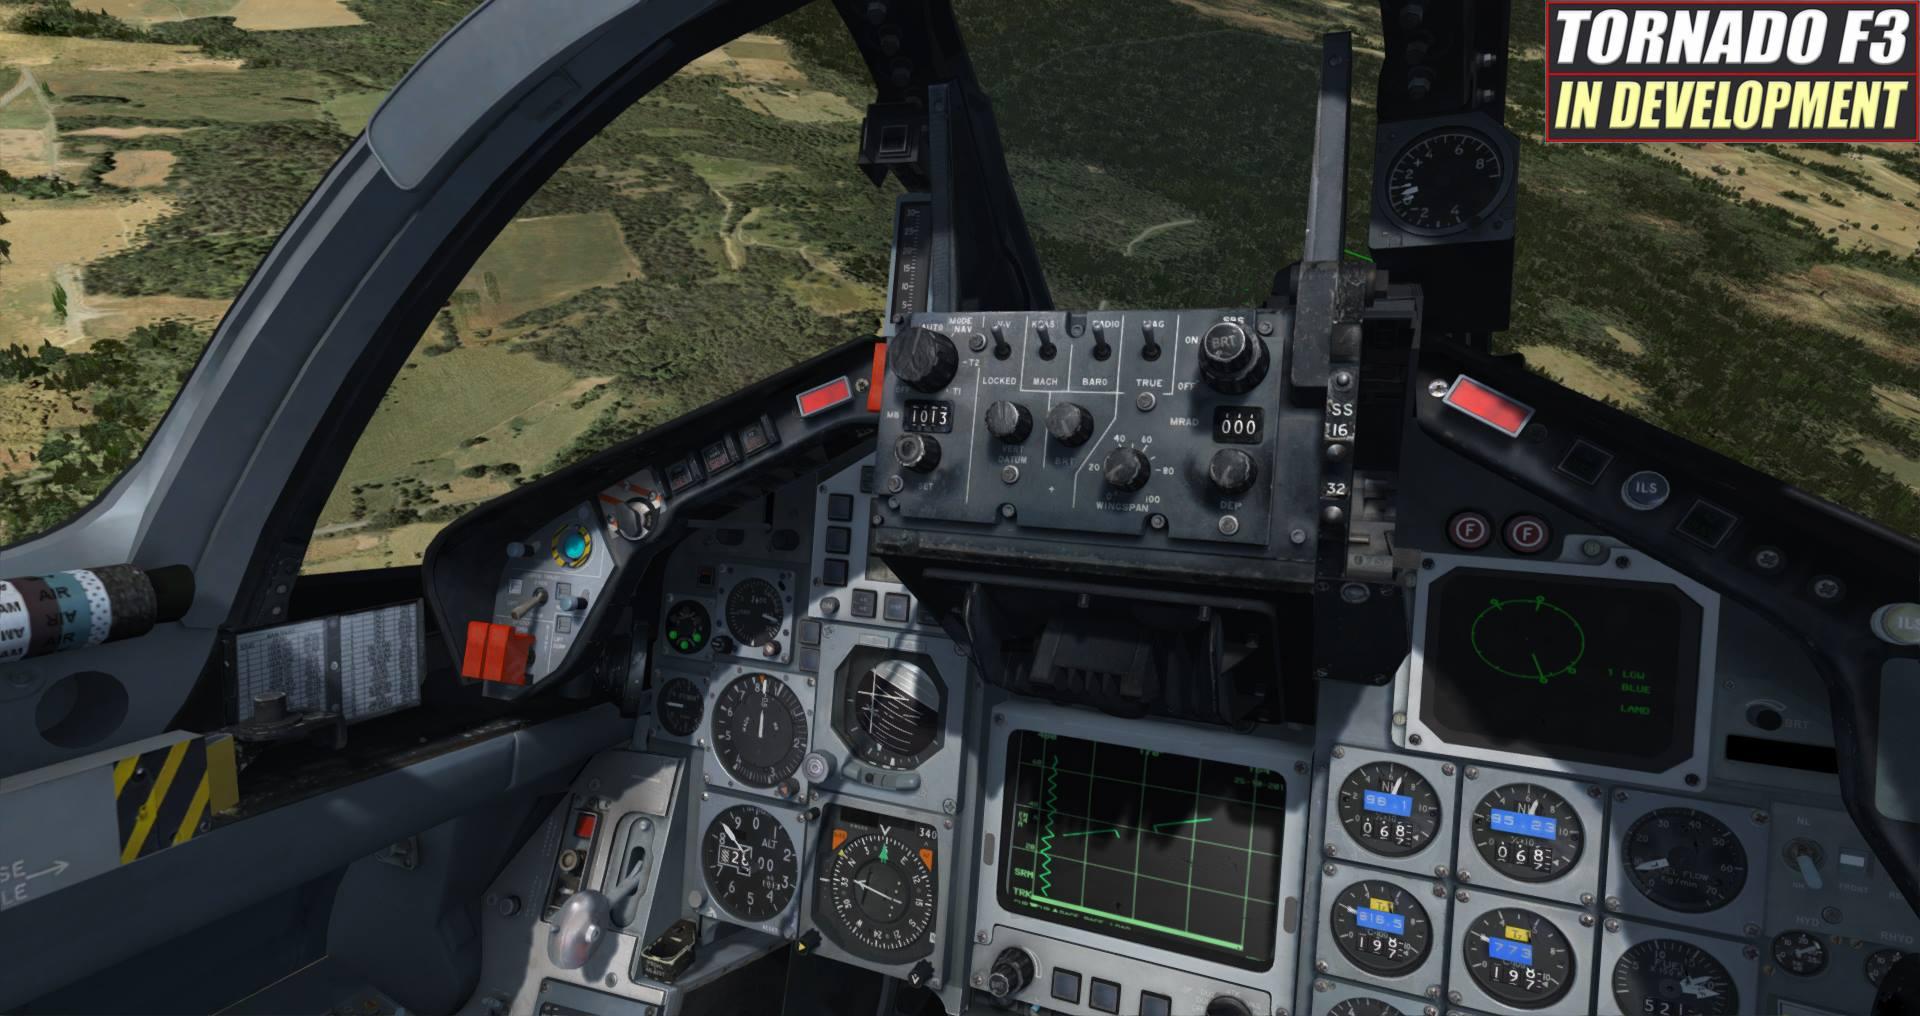 prepar3d / fsx] Just Flight Tease Tornado F3 Before Year's